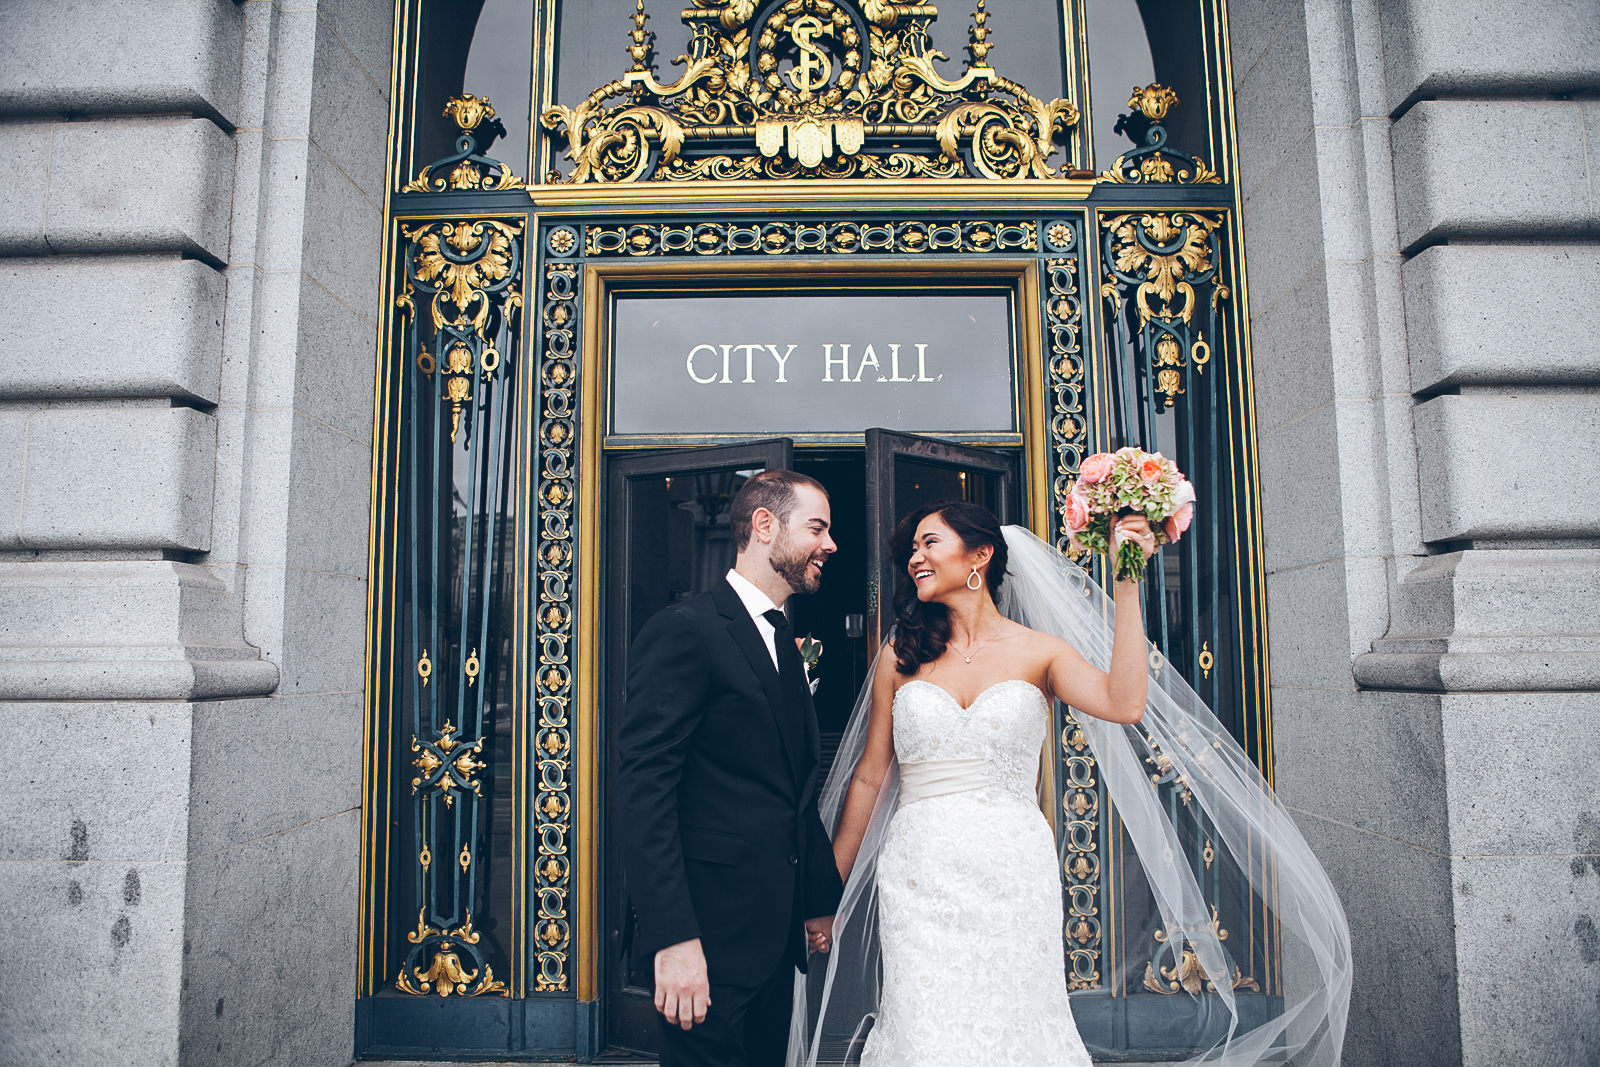 San_francisco_city_hall_wedding_photography_meegan_travis_ebony_siovhan_bokeh_photography_55.jpg